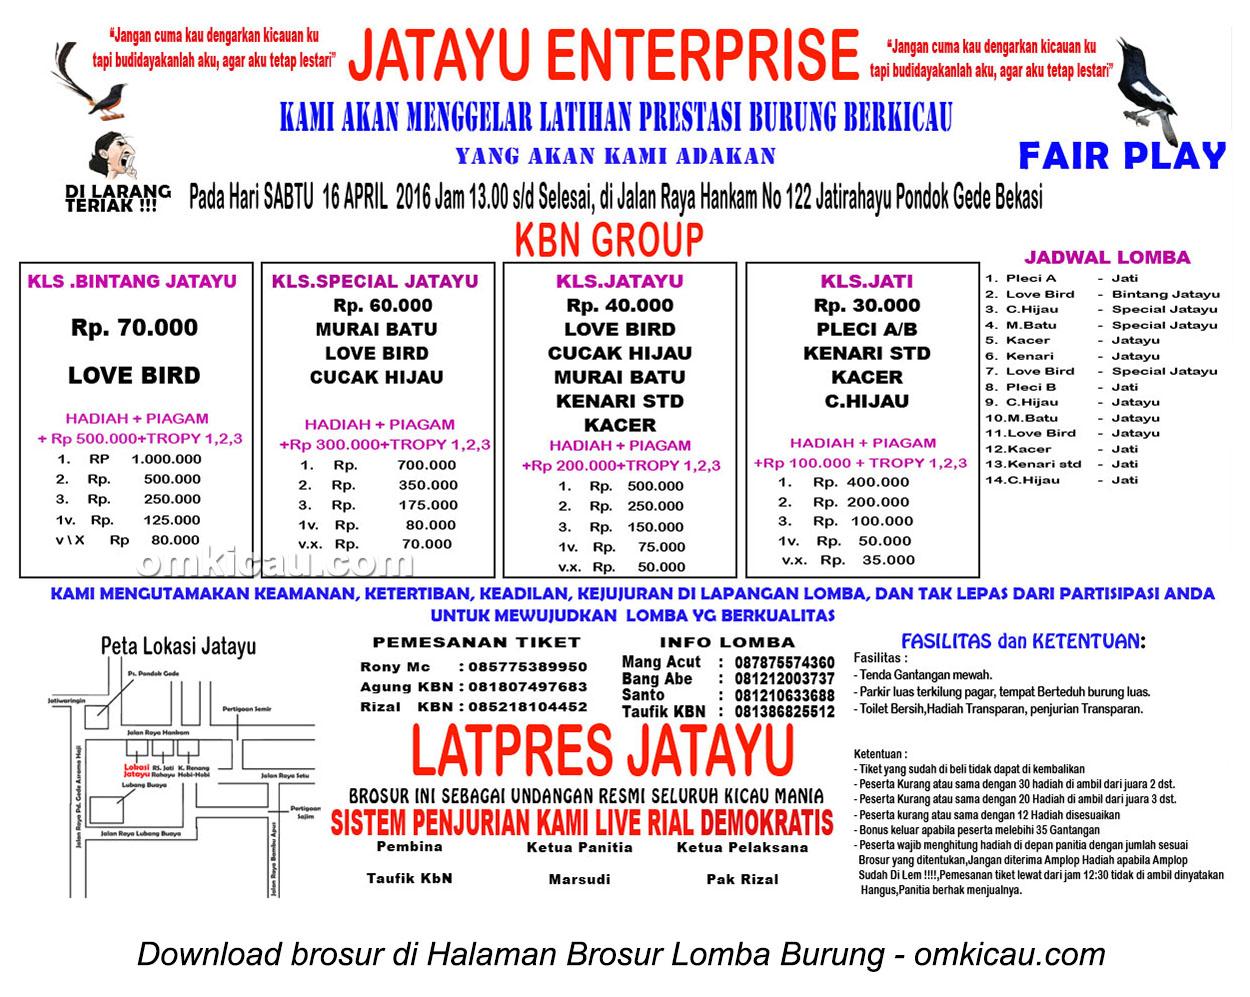 Brosur Latpres Burung Berkicau Jatayu Enterprise, Bekasi, 16 April 2016